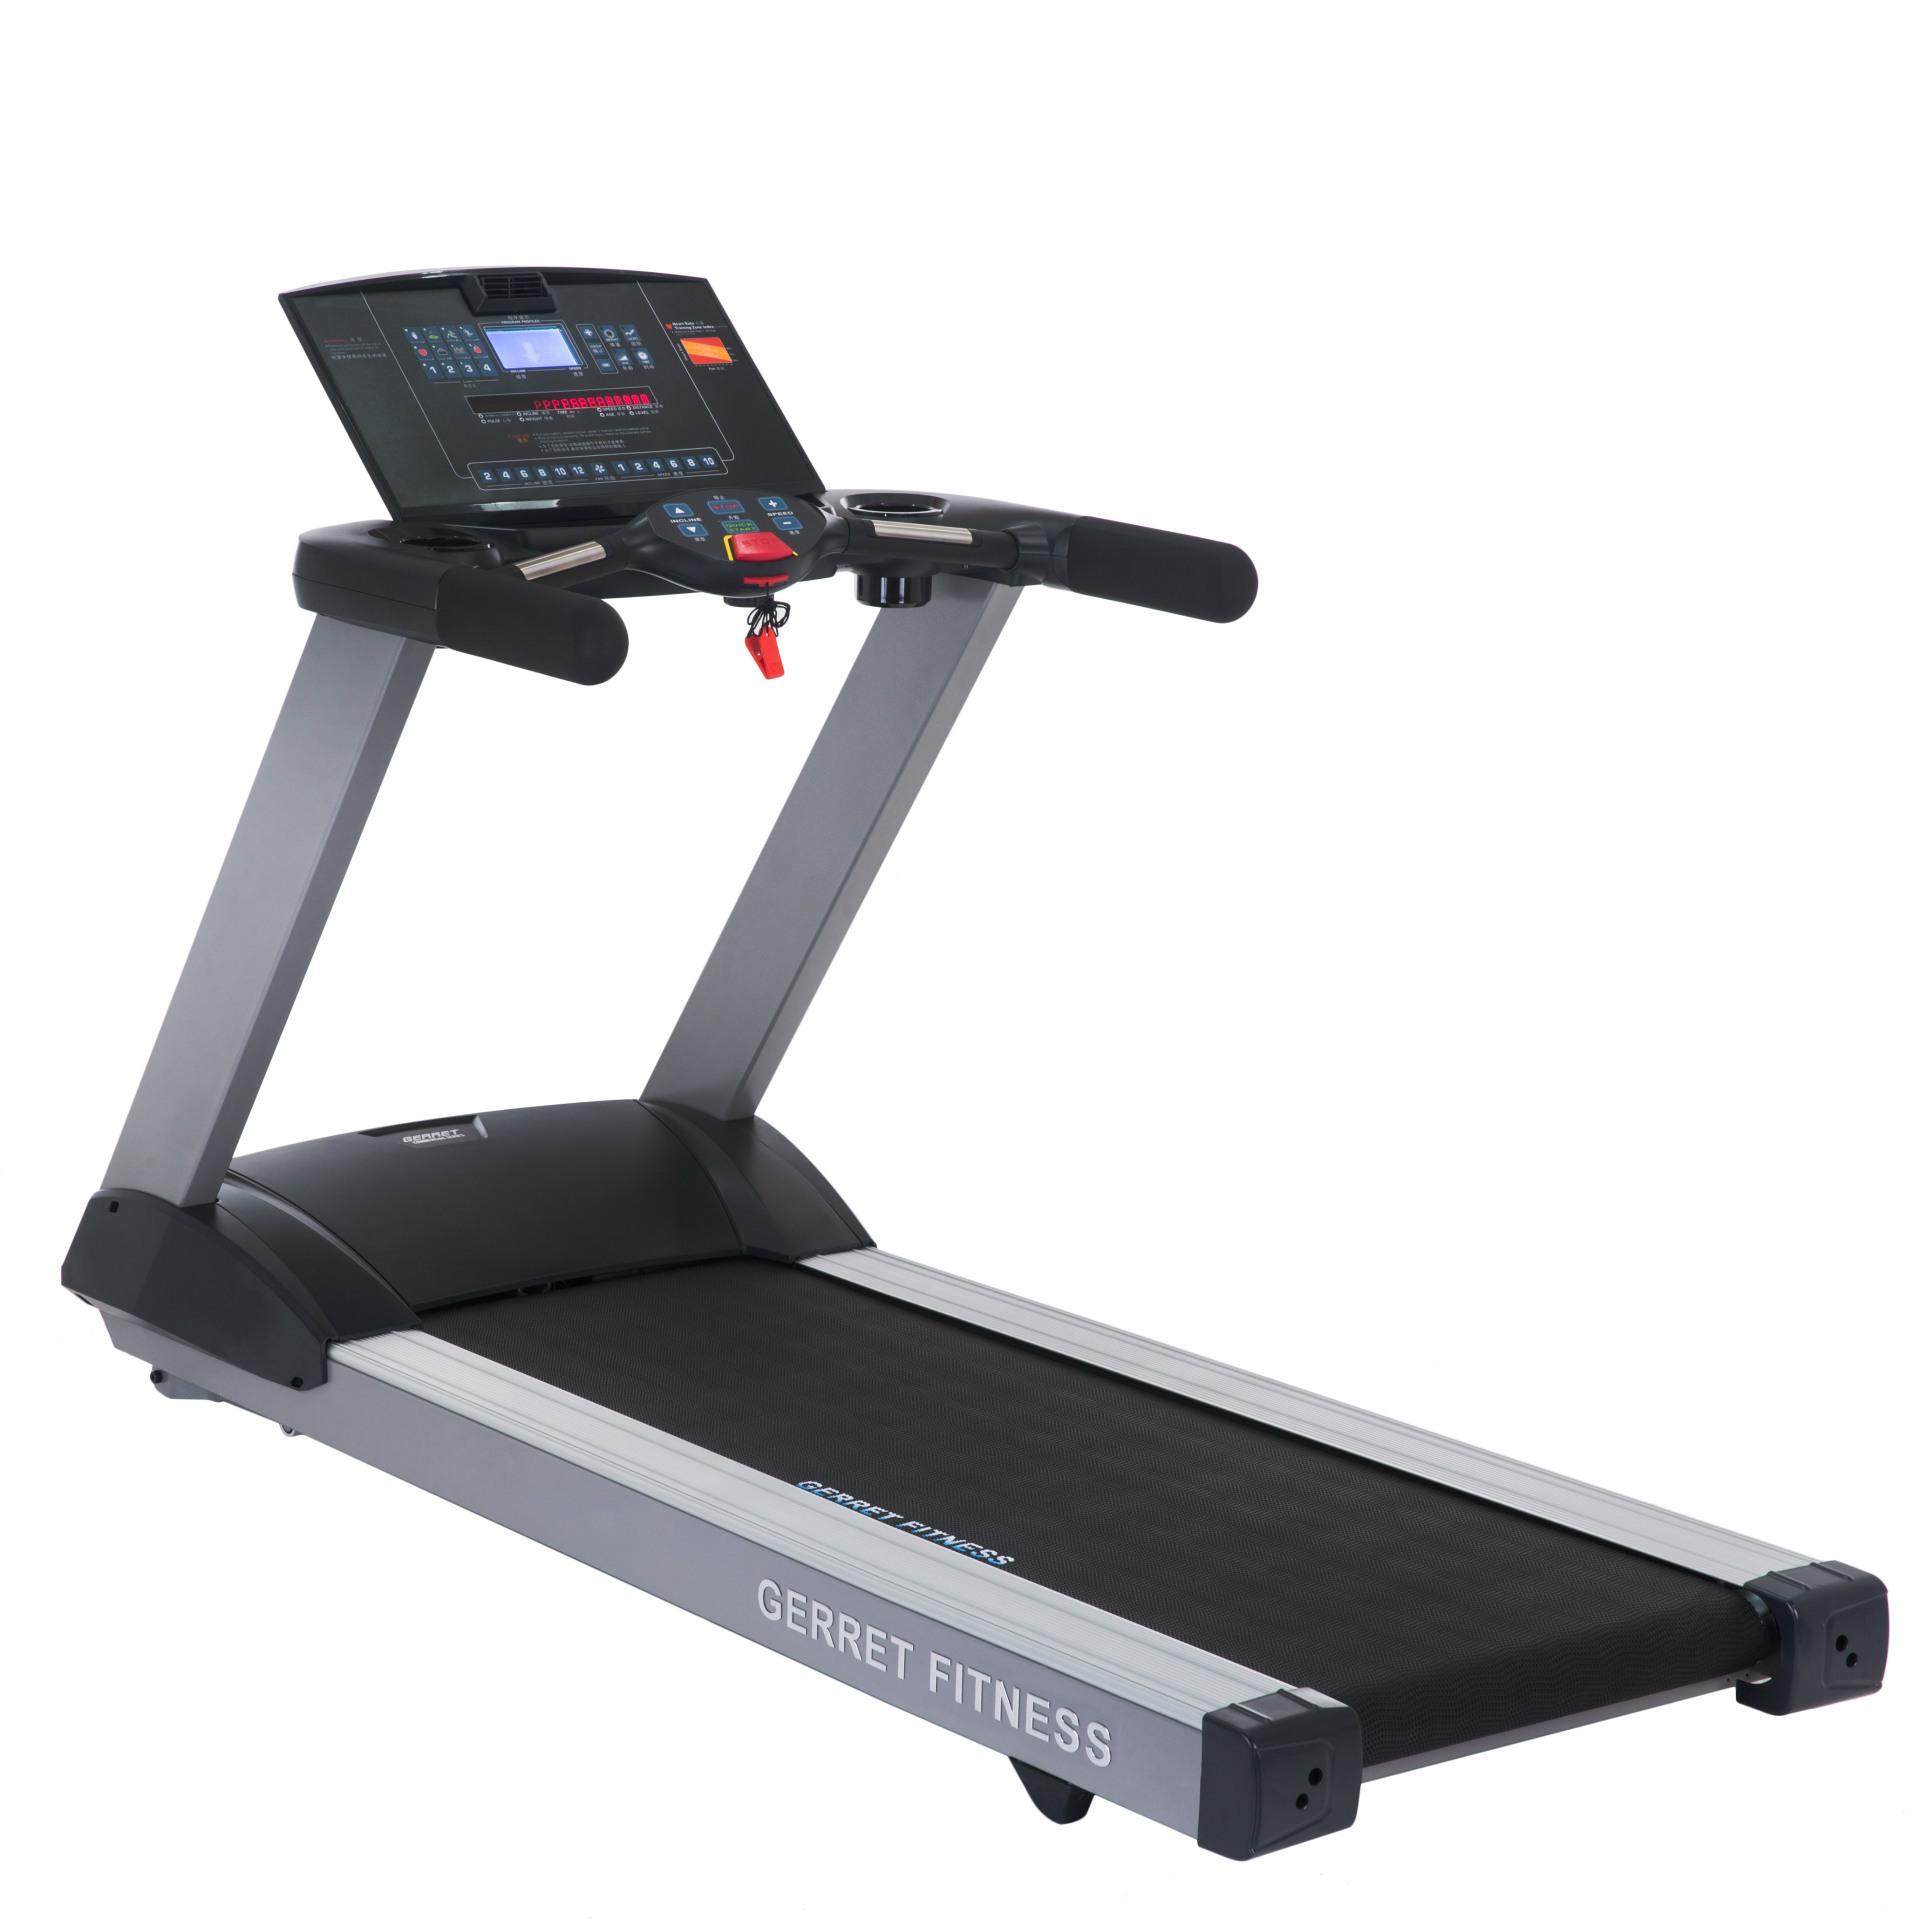 GERRET戈锐特原装进口T8000豪华商用专业电动跑步机